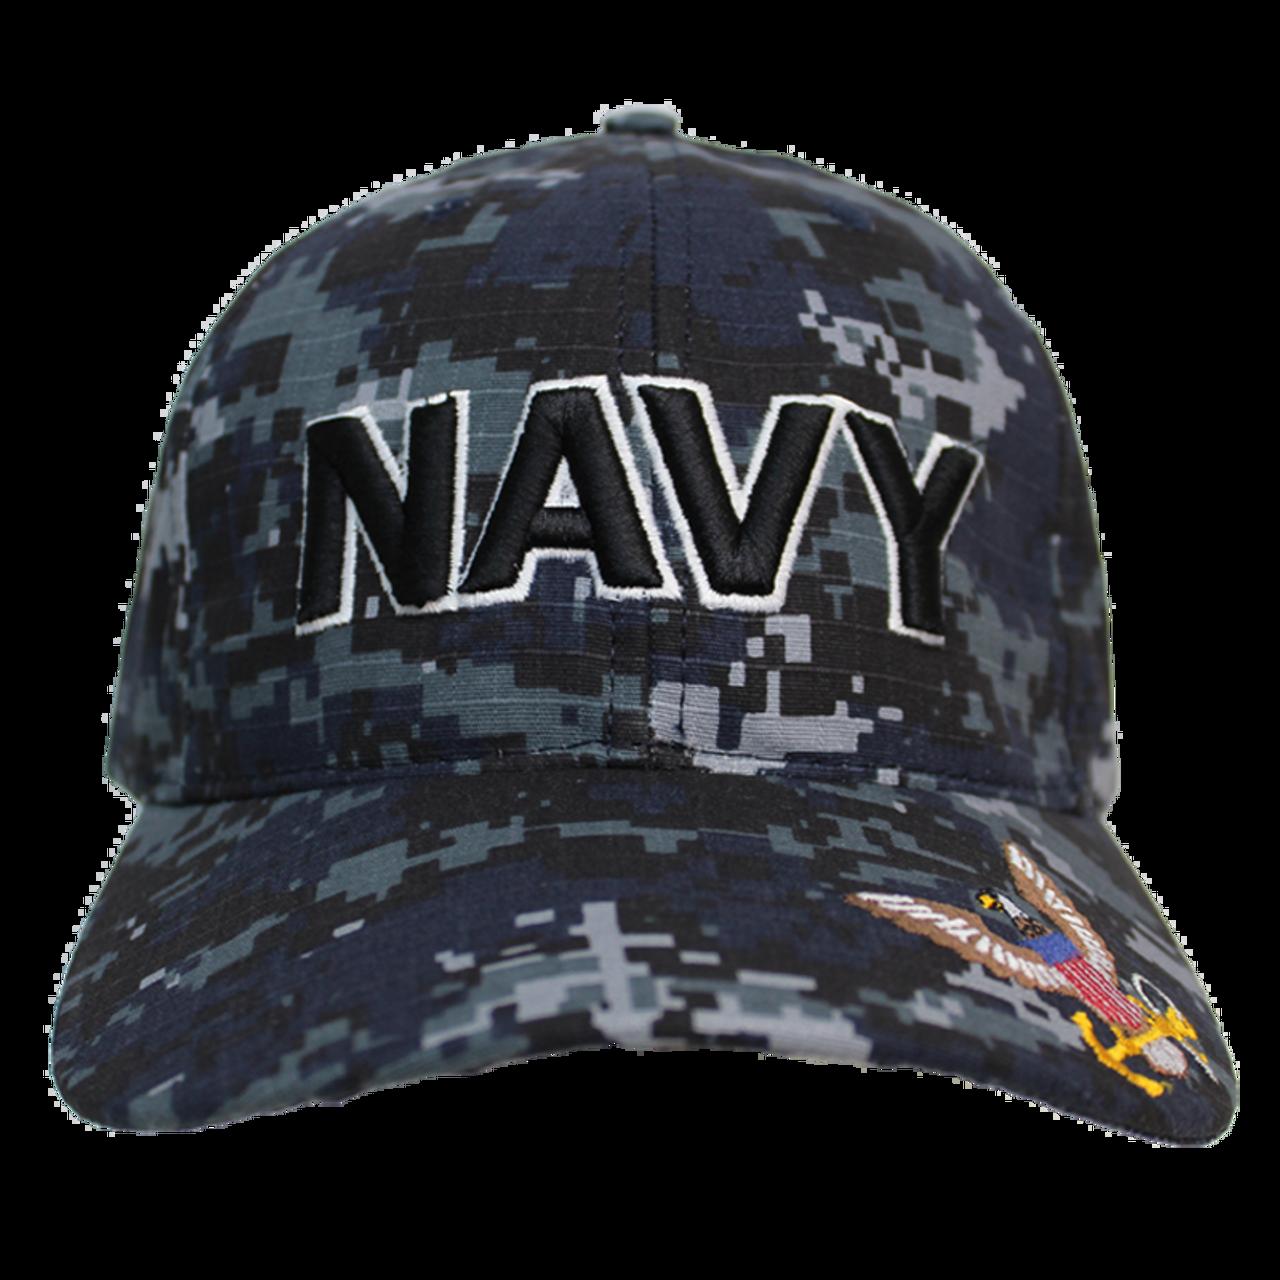 83bce3748 21561 - U.S. Navy Cap - Made in USA - Navy Digital Camo